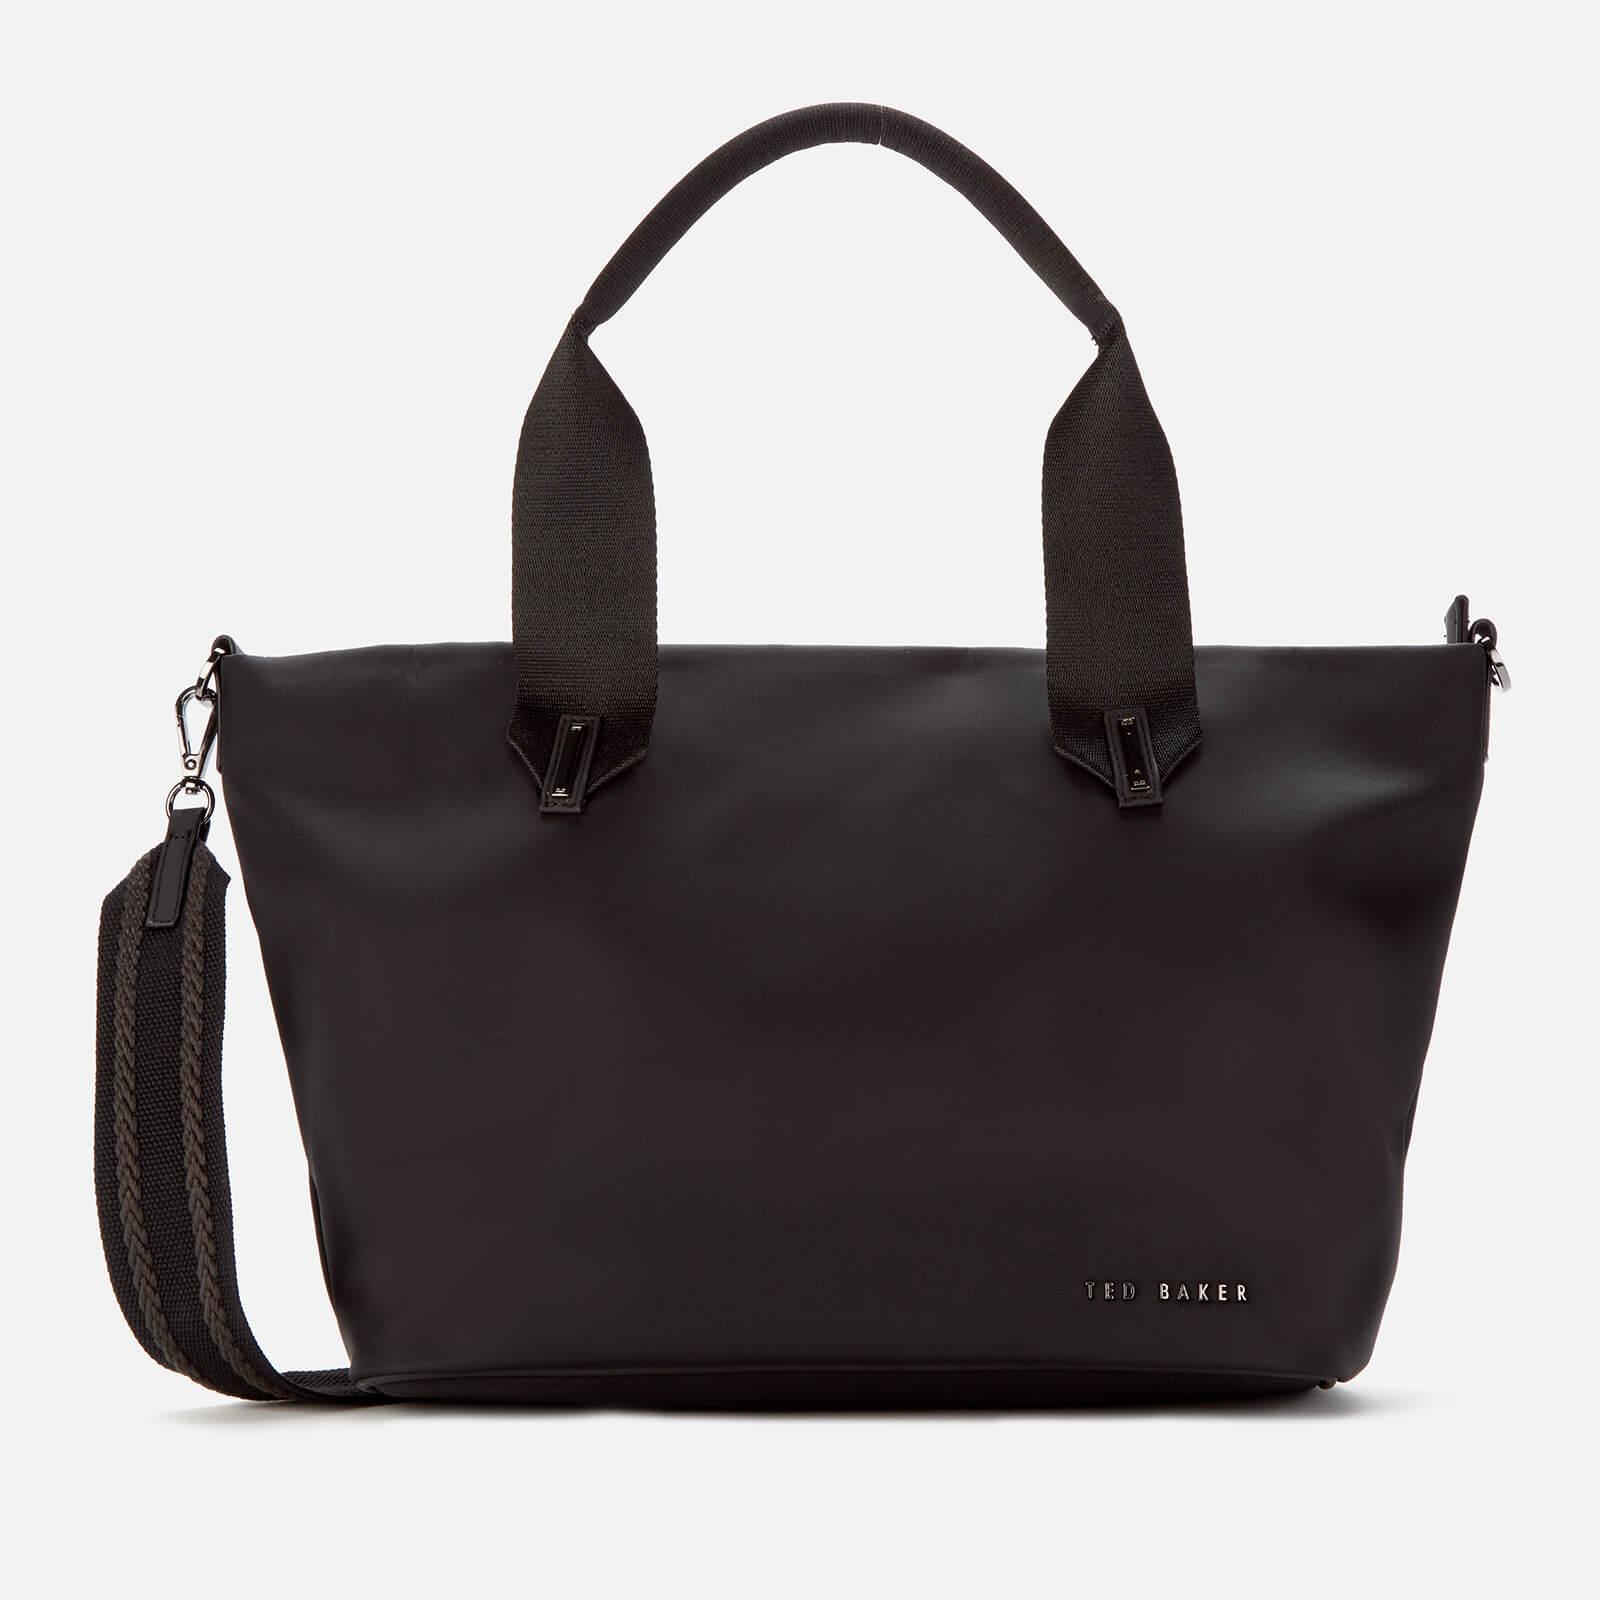 Ted Baker Women's Macieyy Plain Small Nylon Tote Bag - Black